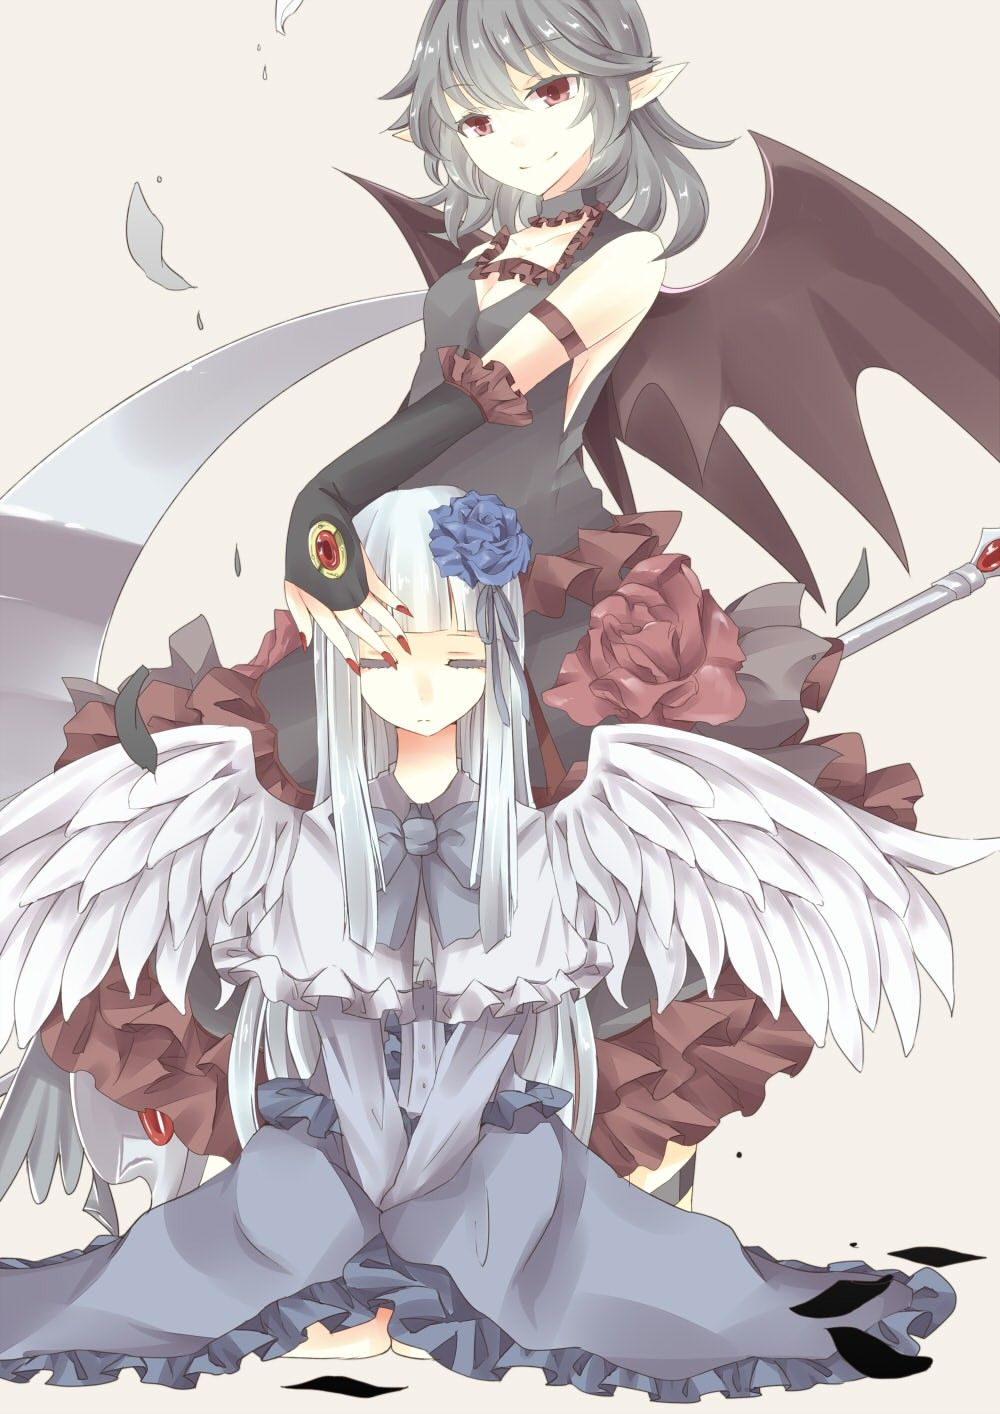 Pin on Anime and Manga stuff